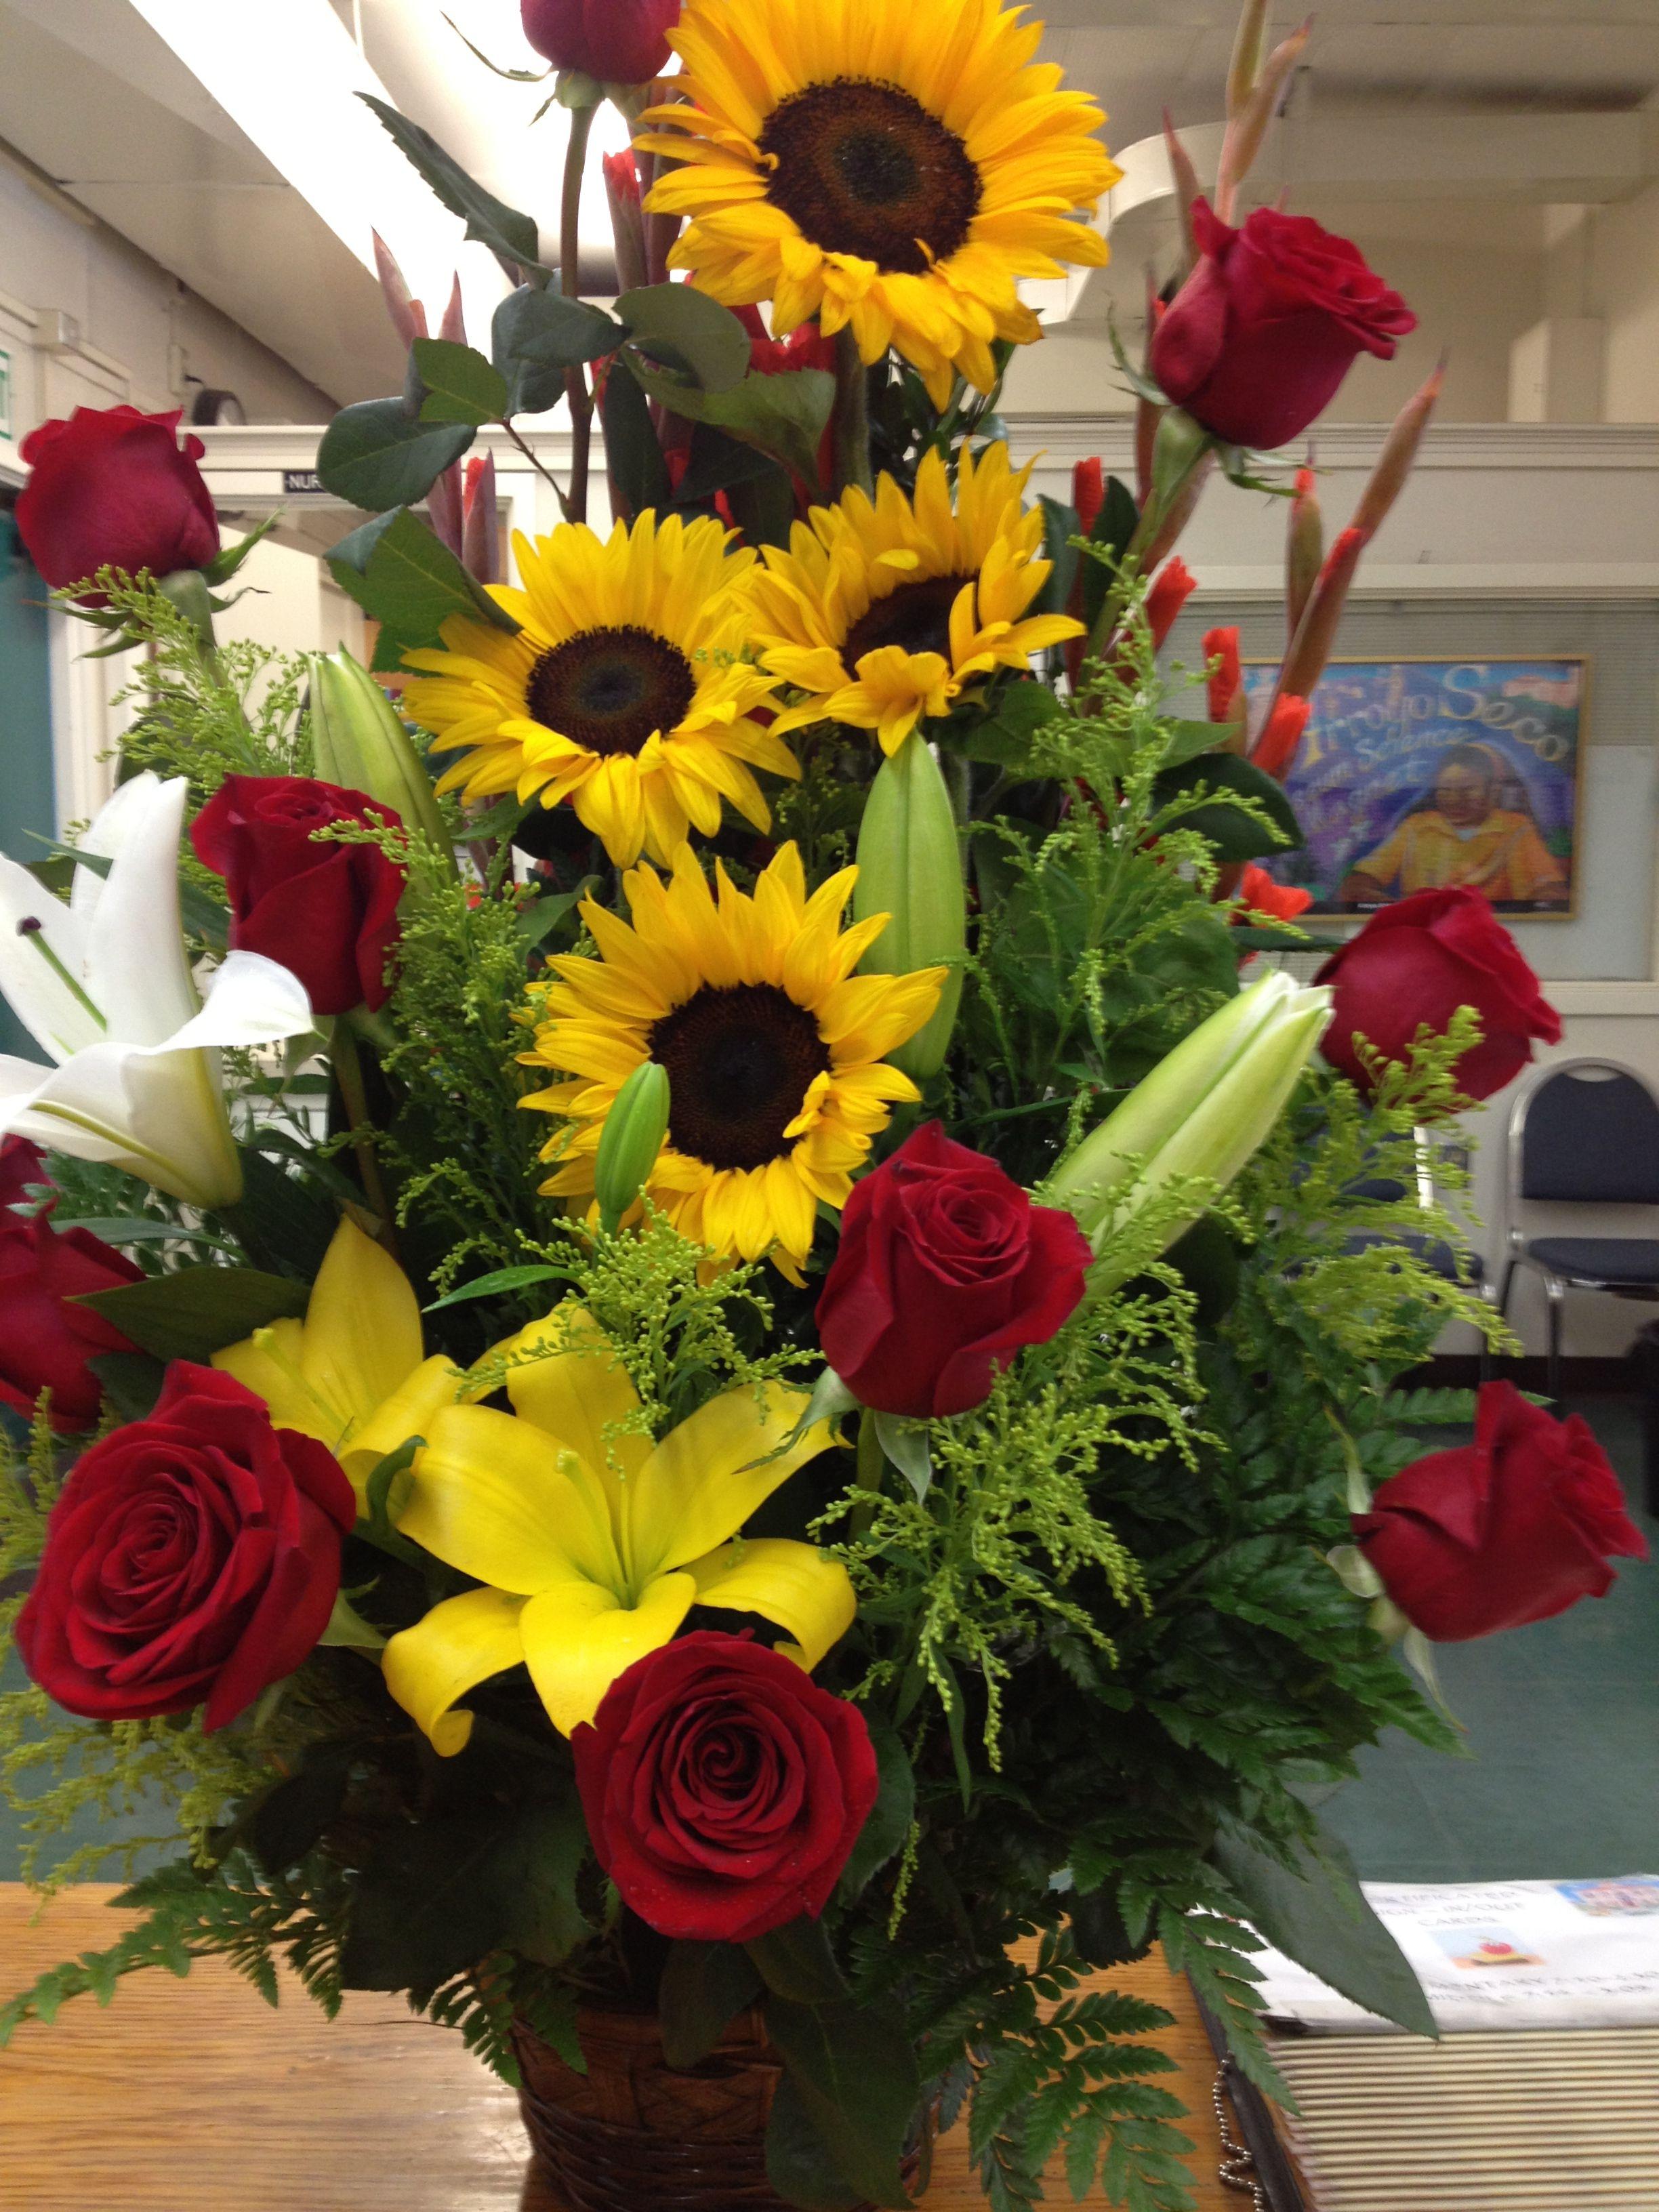 Sunflowers n Roses   Flower arrangement designs, Valentine flower arrangements, Sunflowers and roses